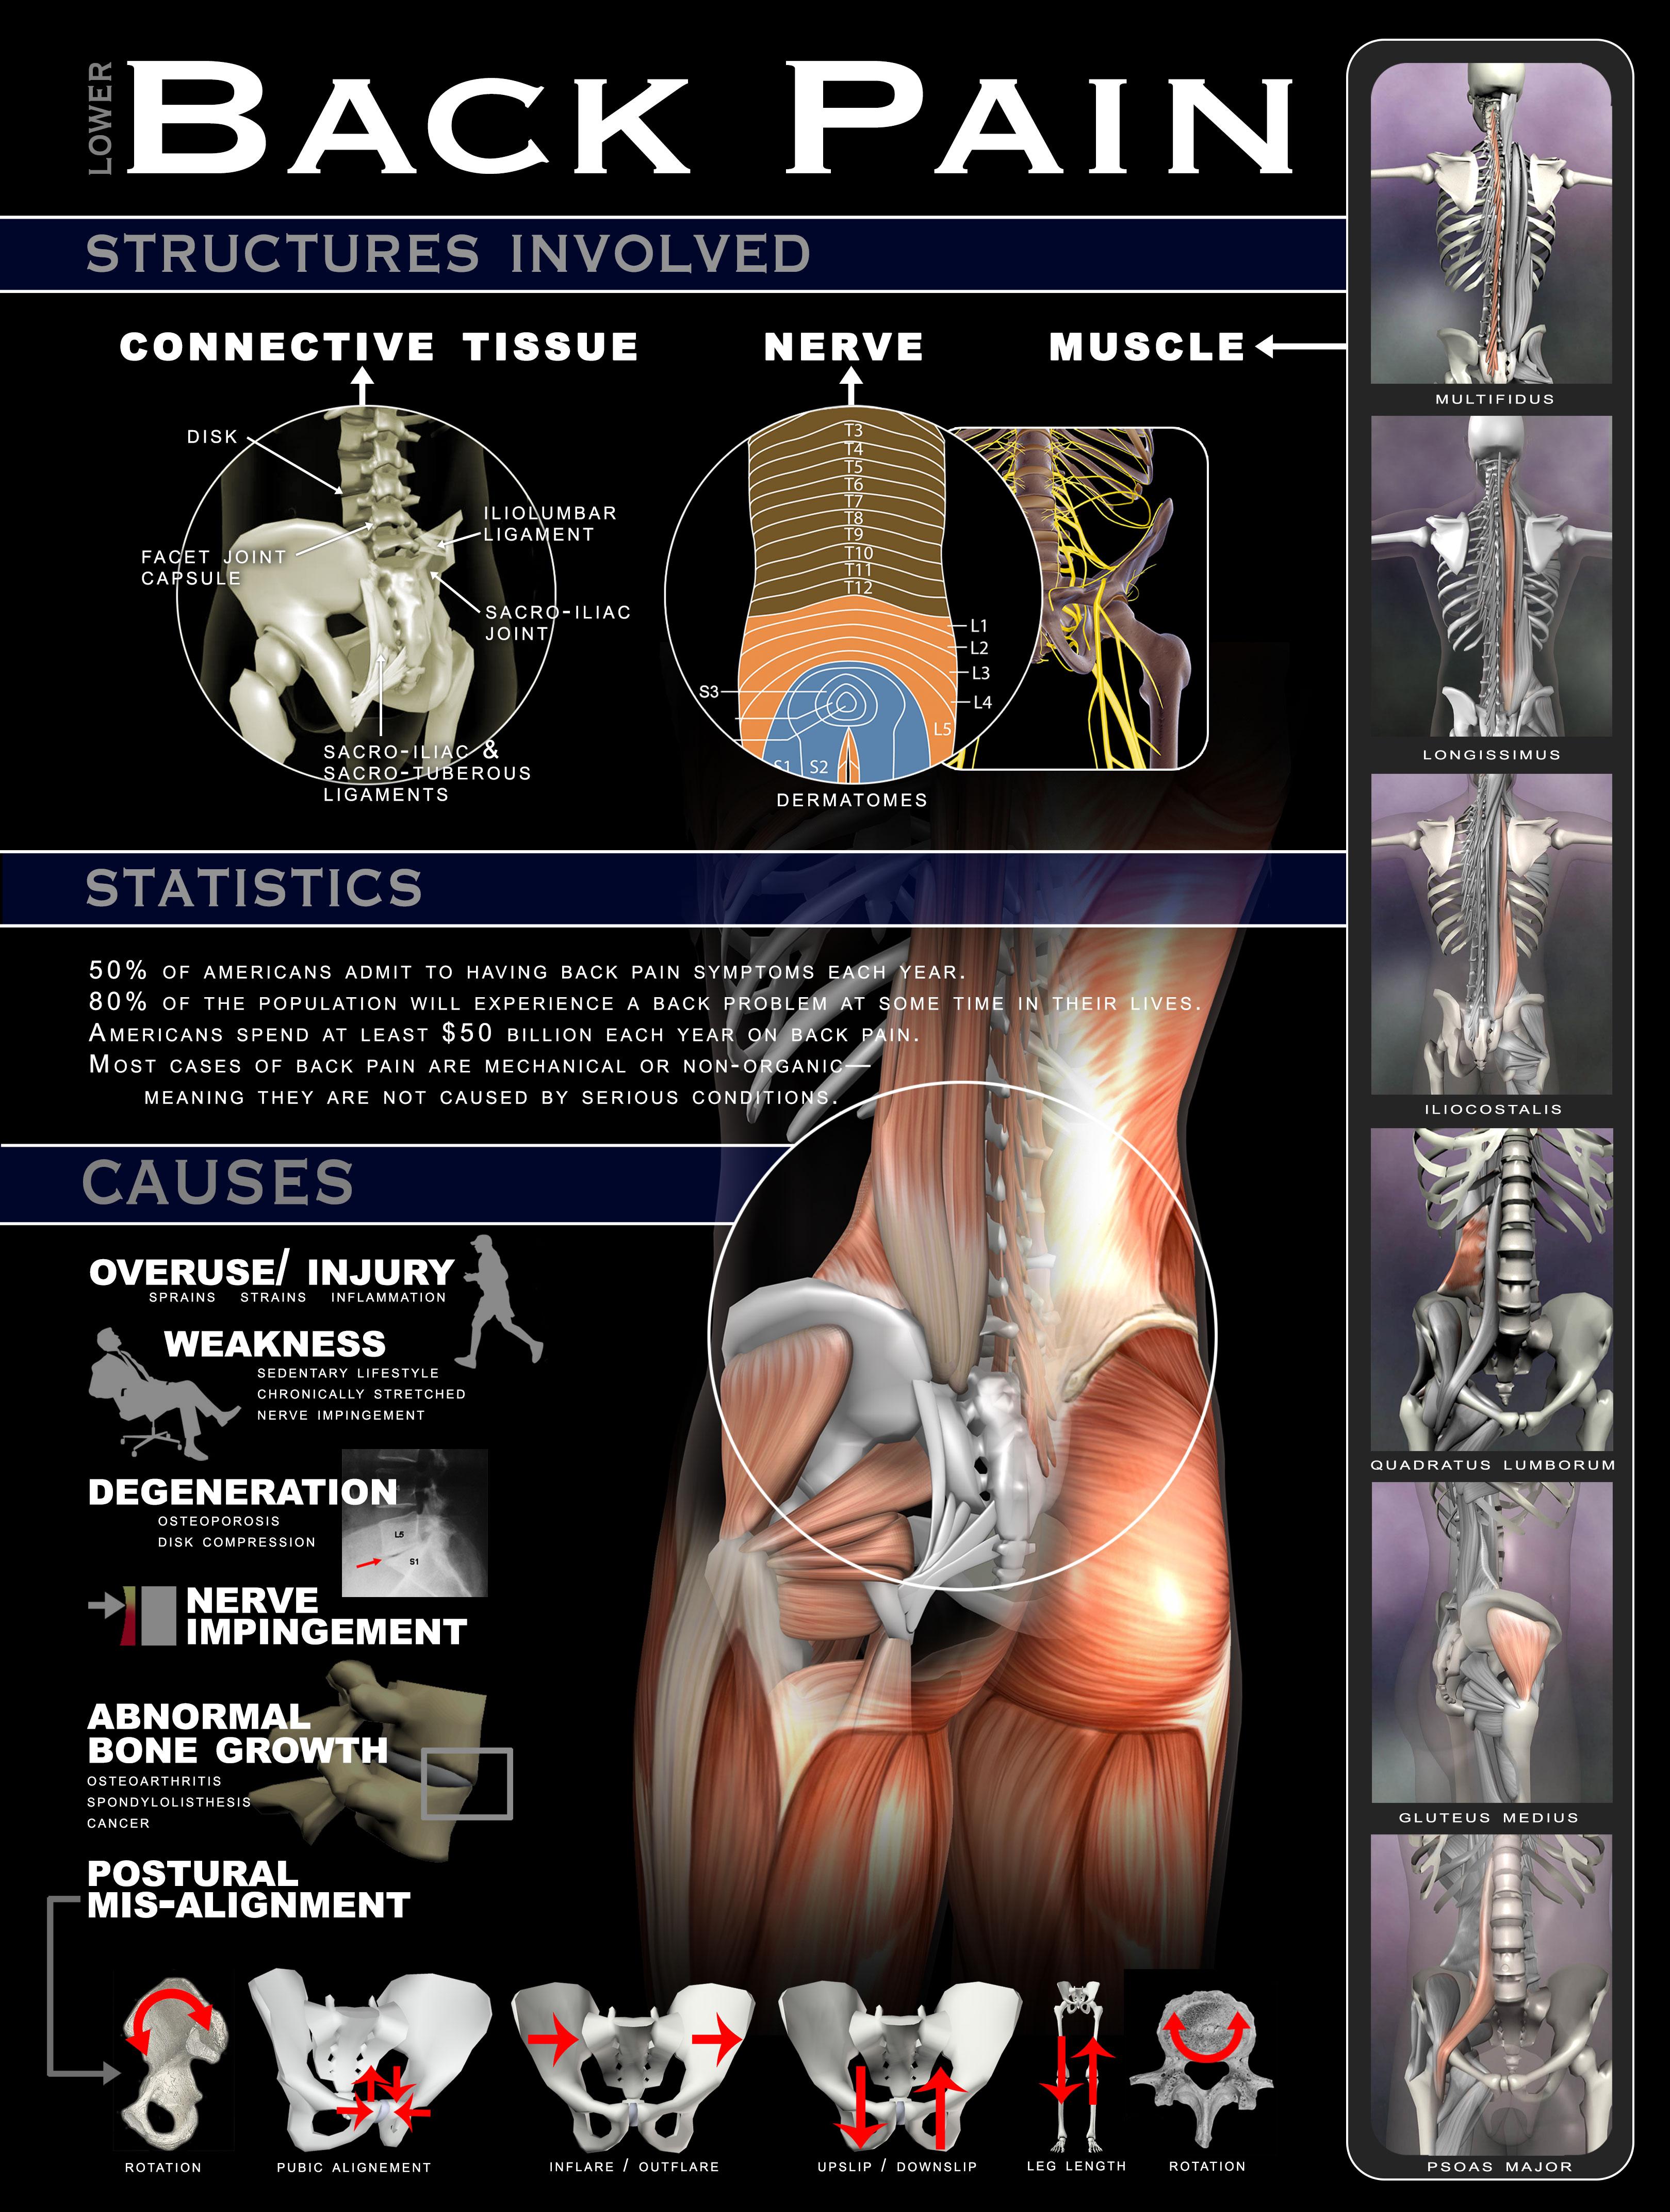 Back Pain Poster 18x24 - Real Bodywork